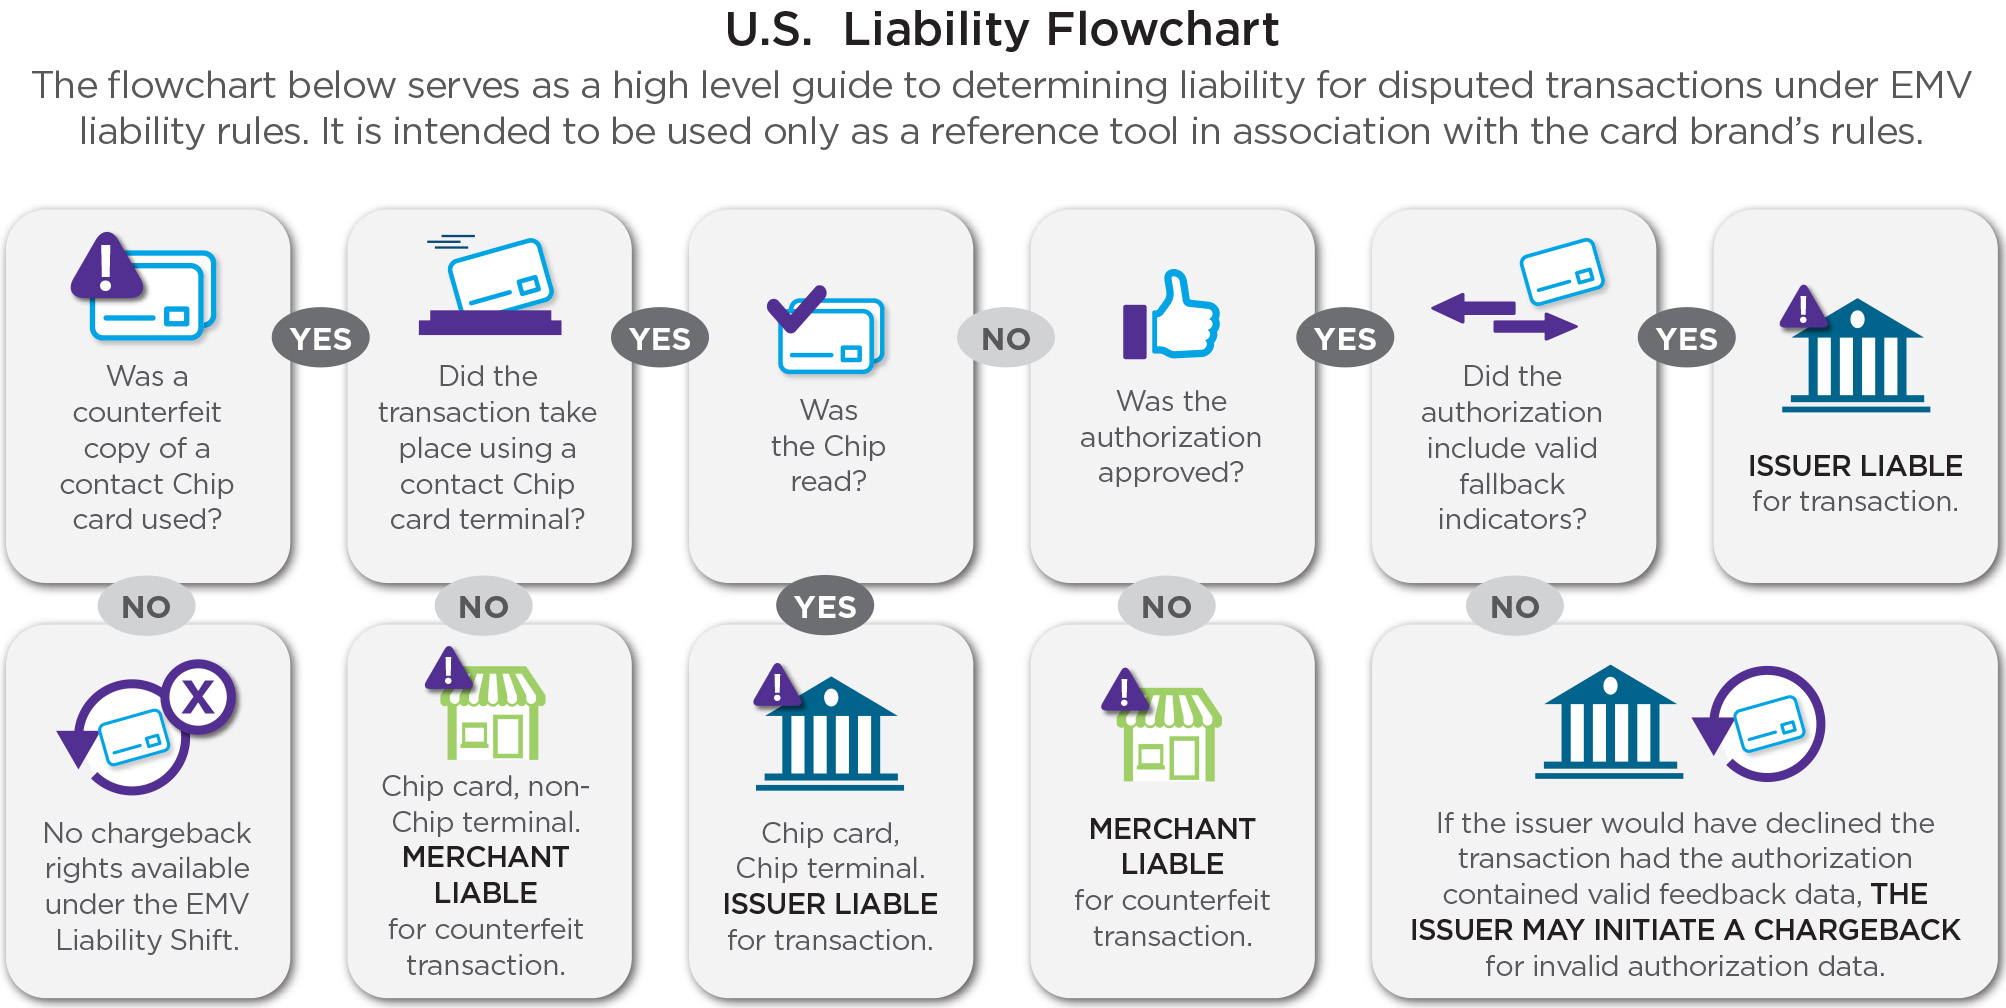 EMV liability flow chart